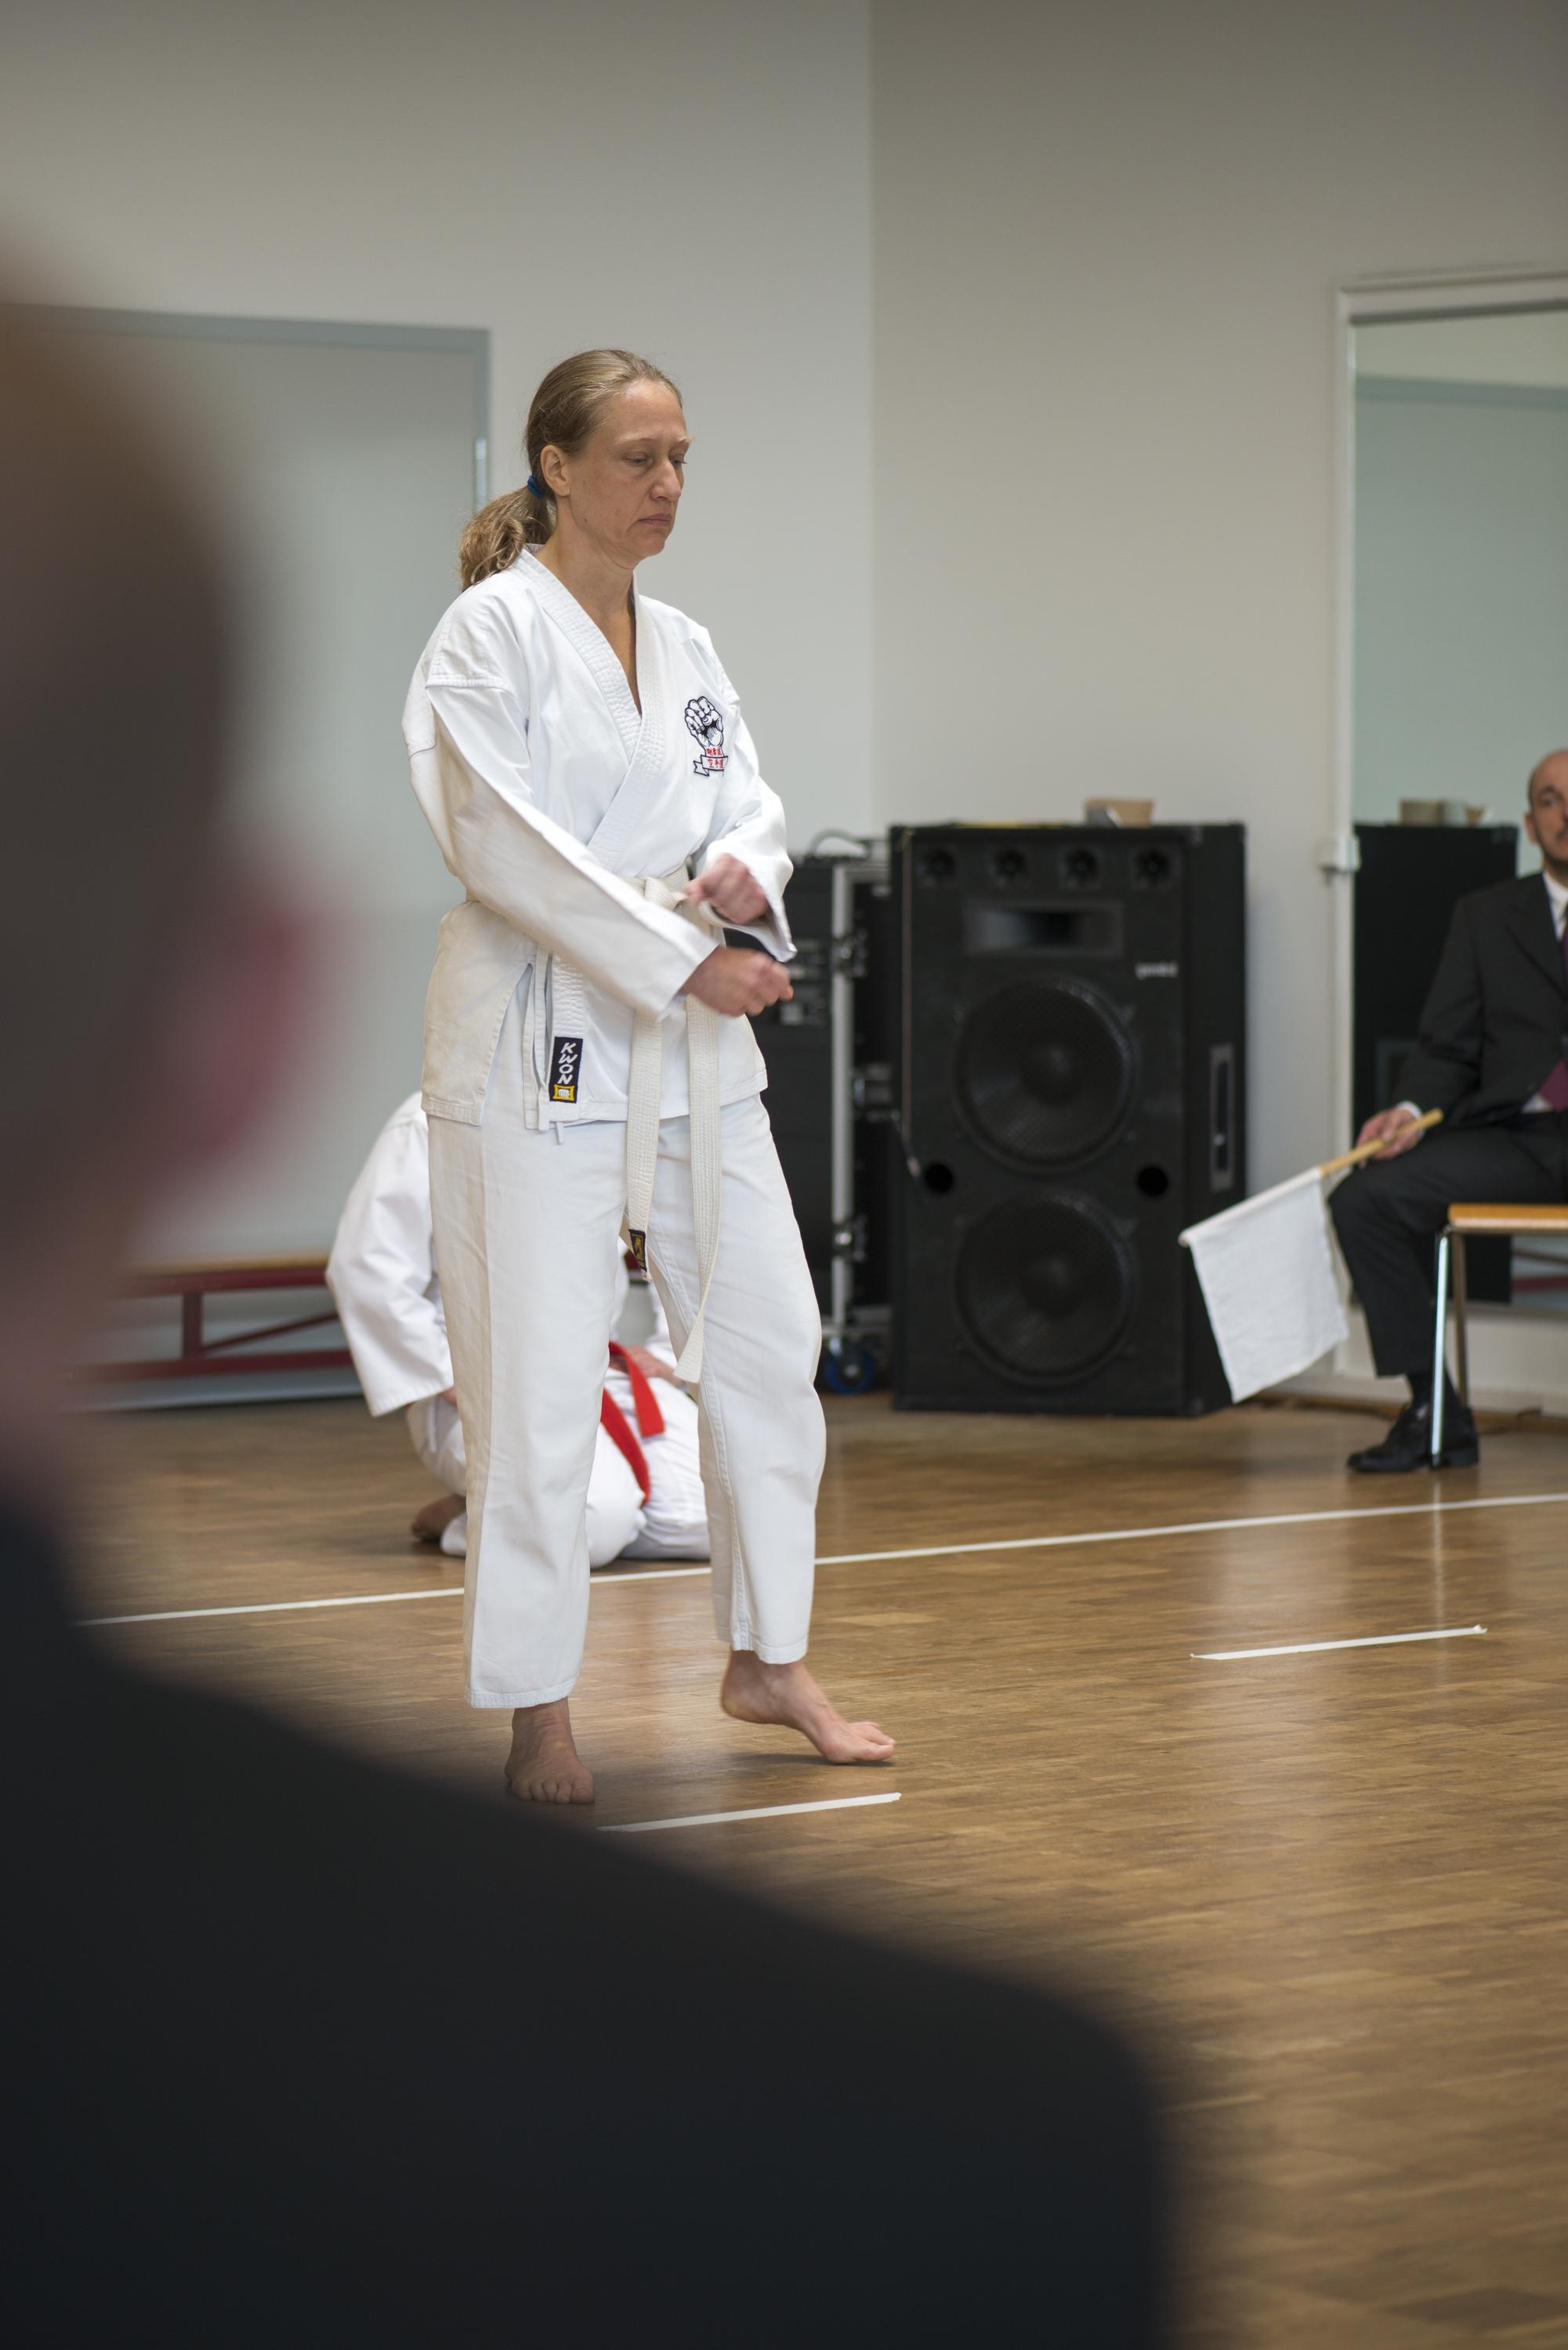 2016-04-26 Kata Turnier Kaarst 134